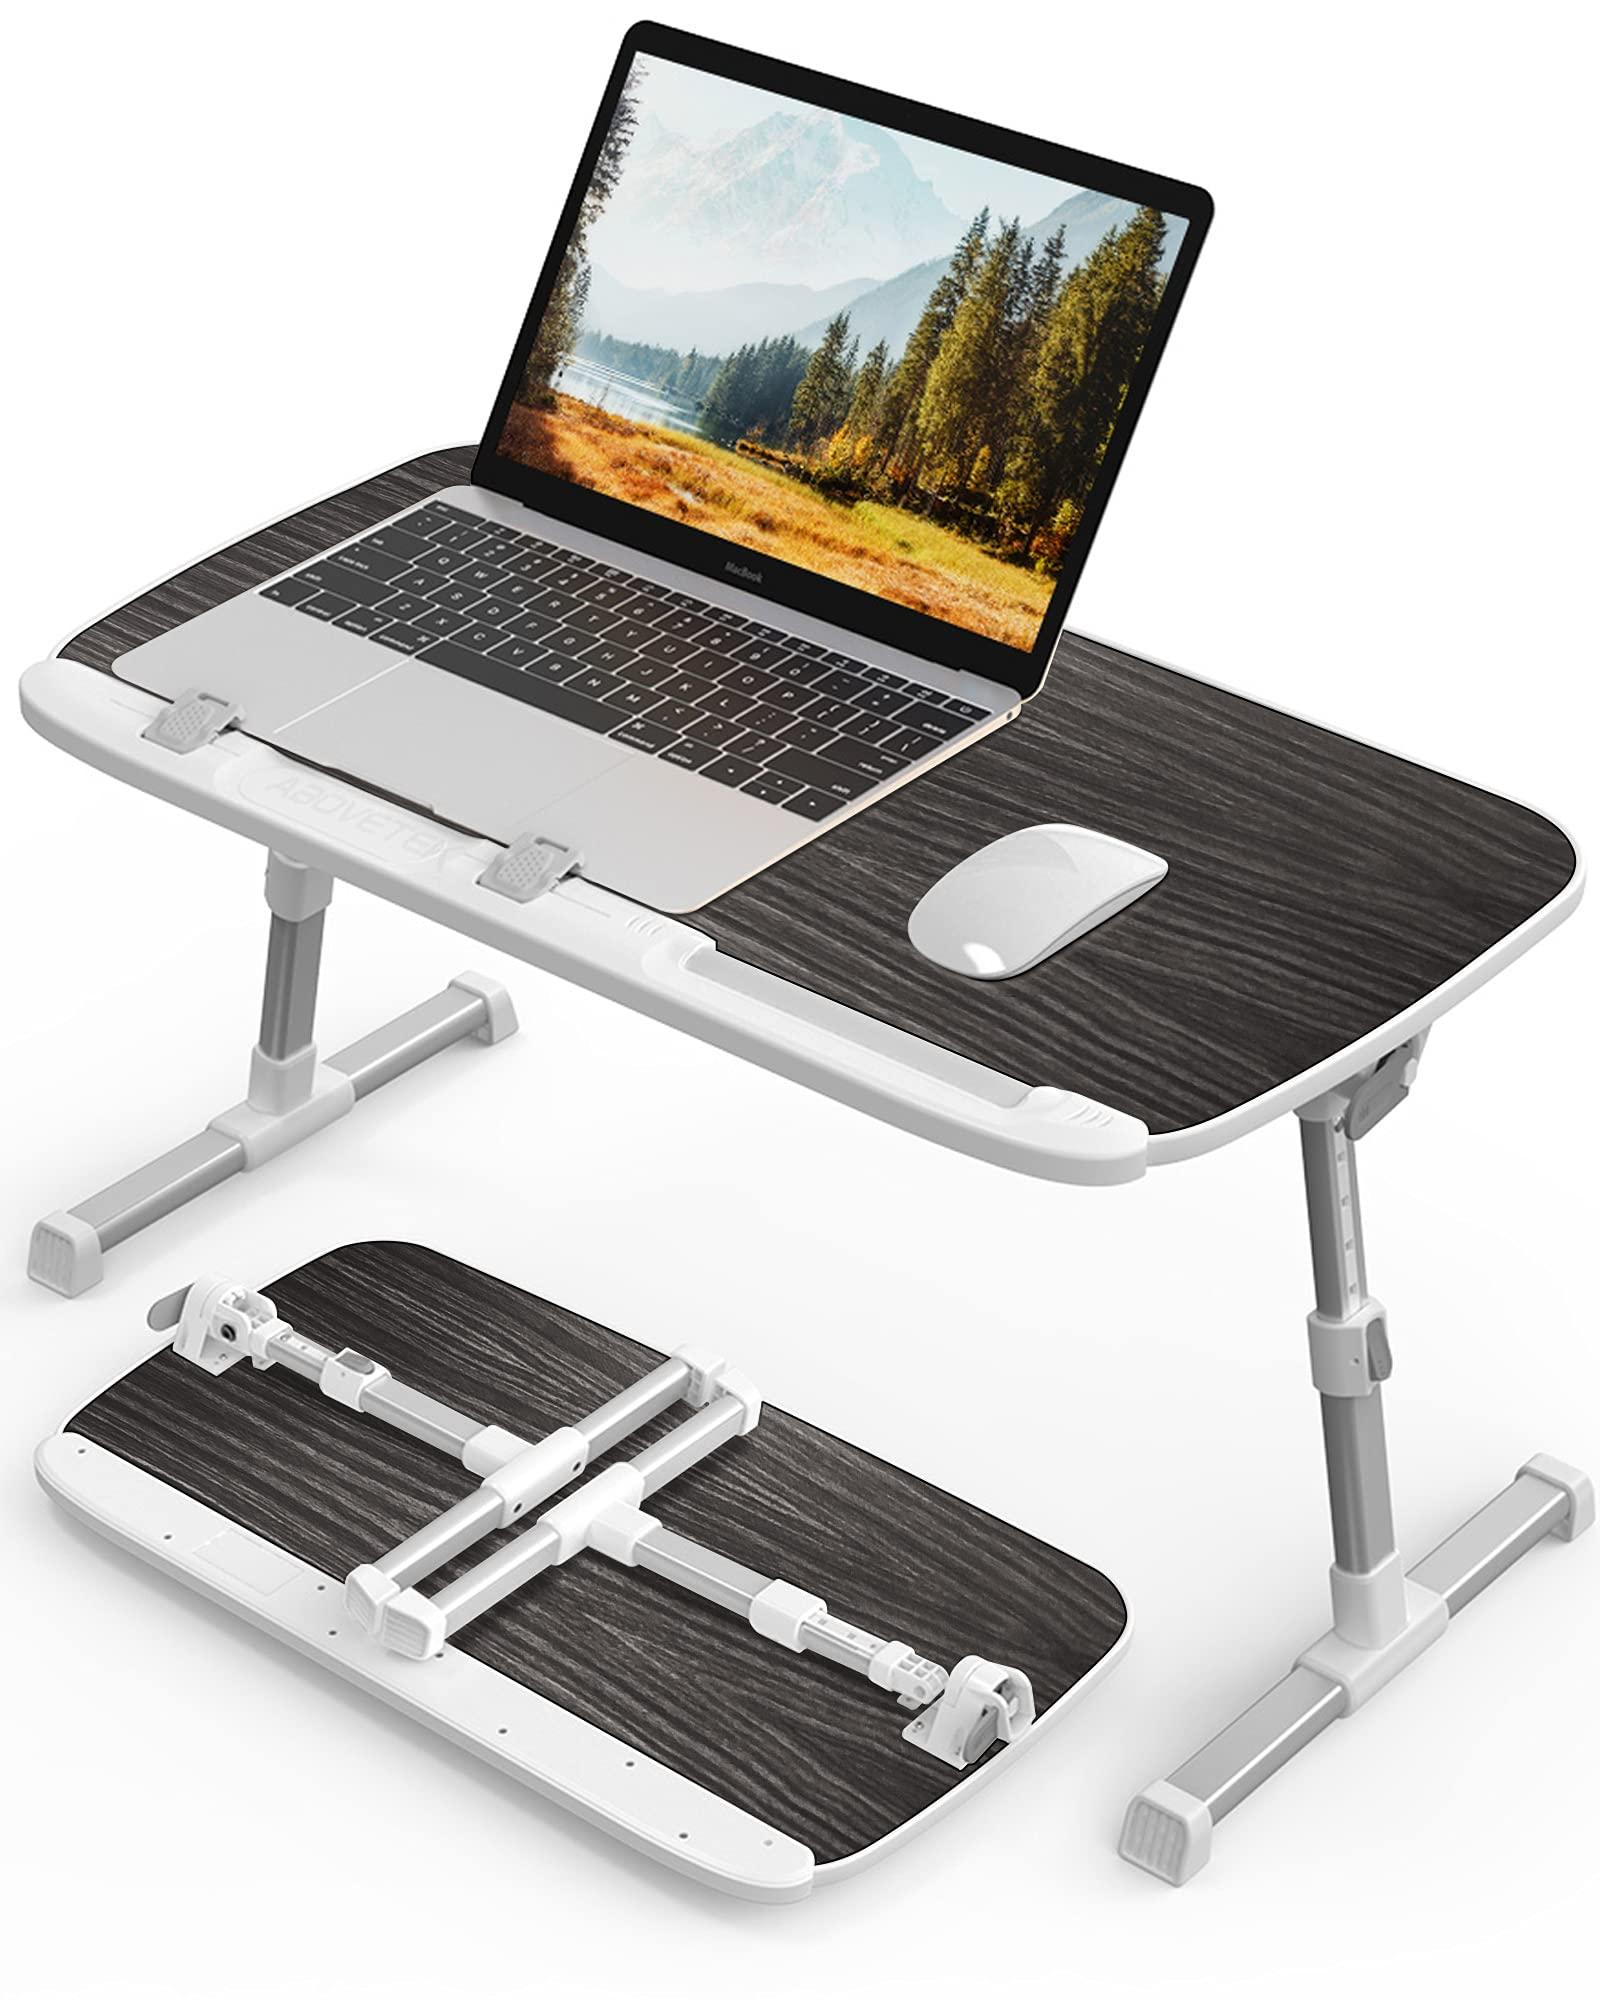 Mesa Plegable y Ajustable para Notebook - AboveTEK - 8JBQXFL